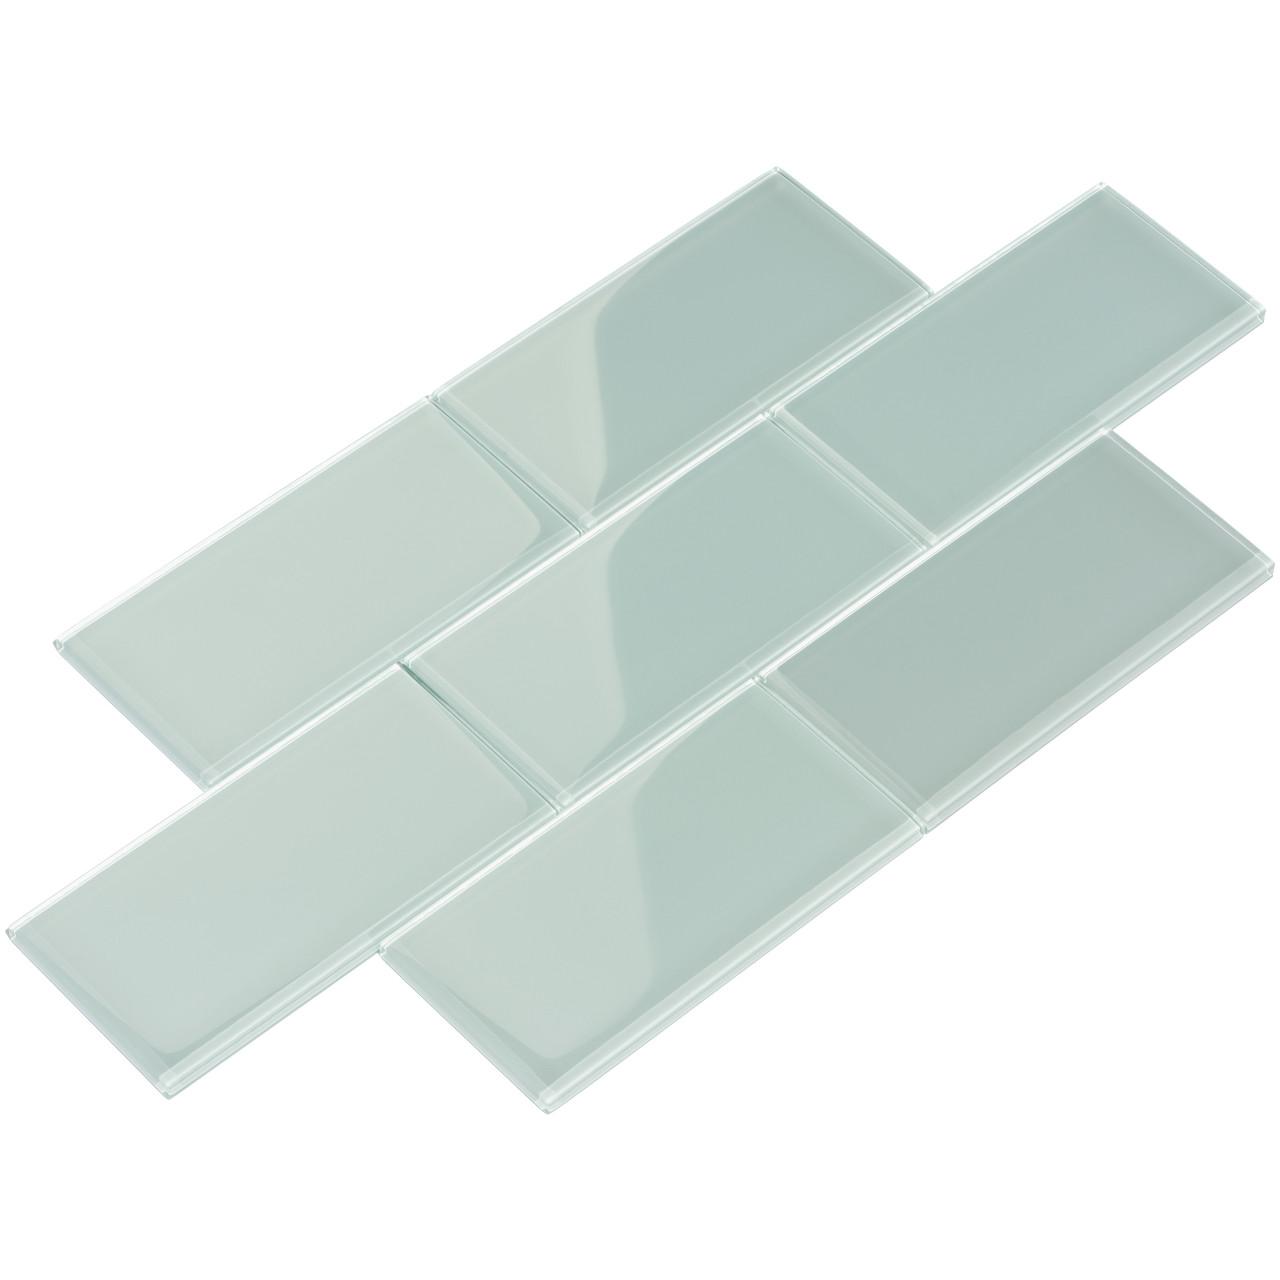 giorbello glass subway tile 3 x 6 baby blue